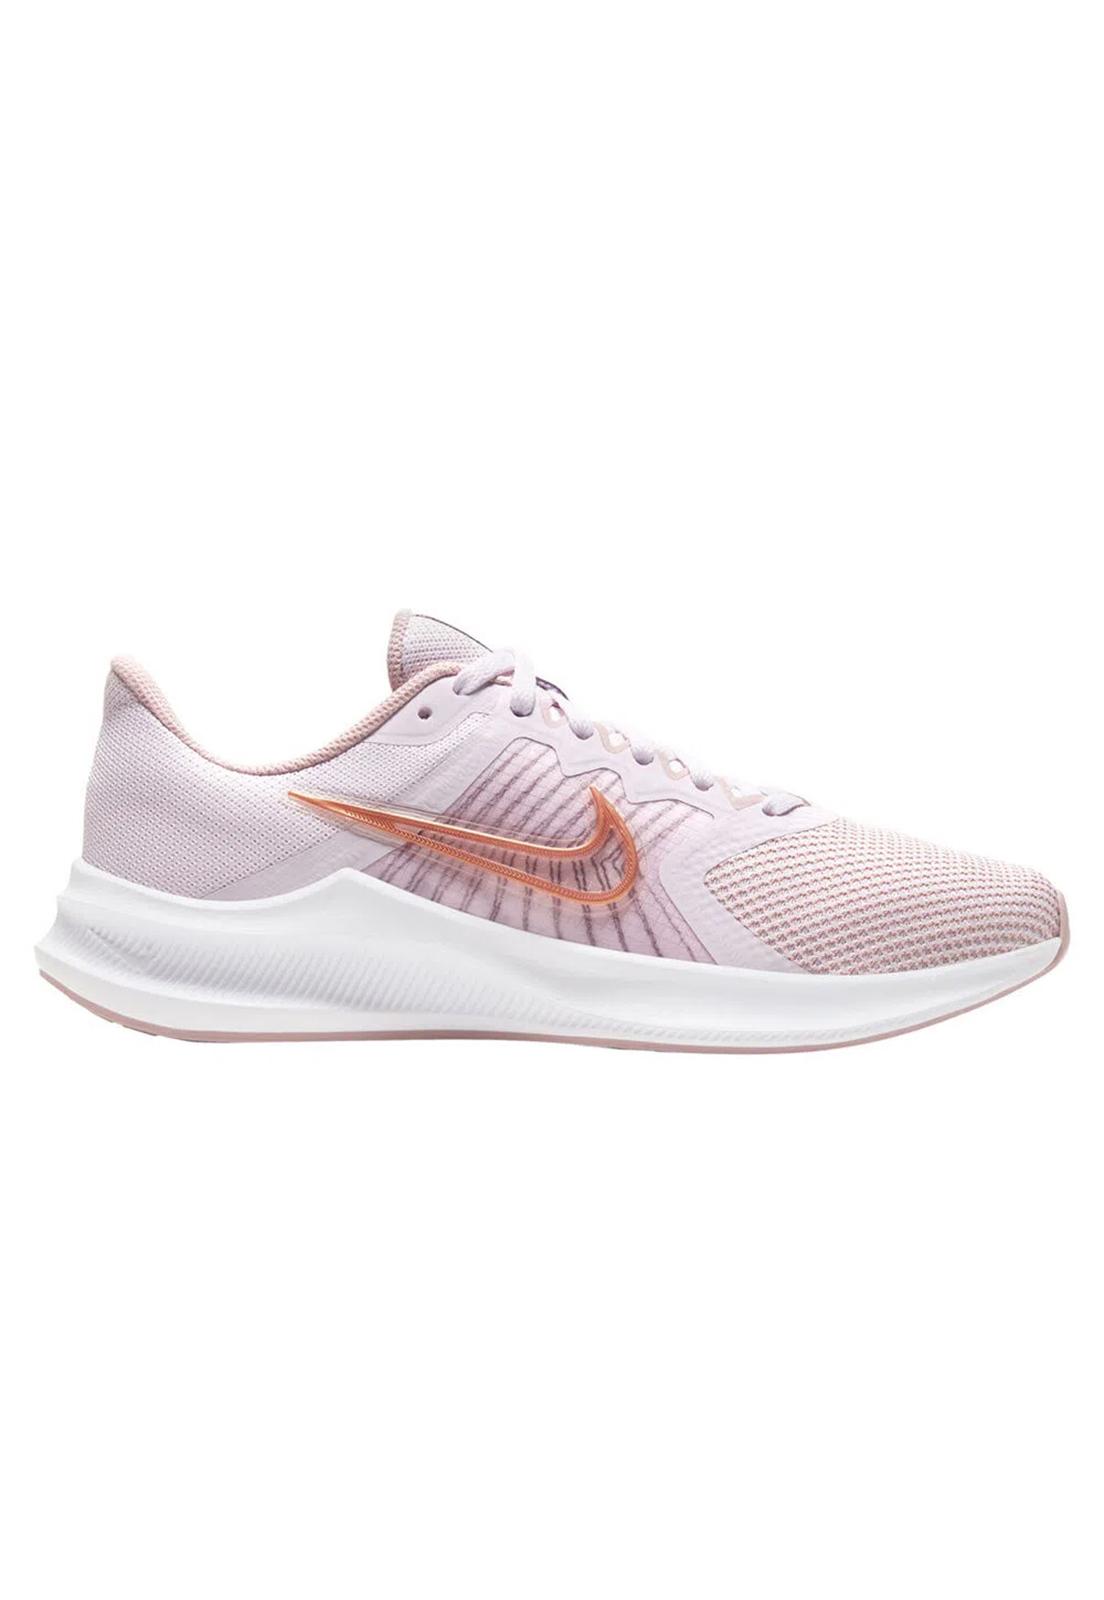 Tênis Nike Downshifter 11 Rosa